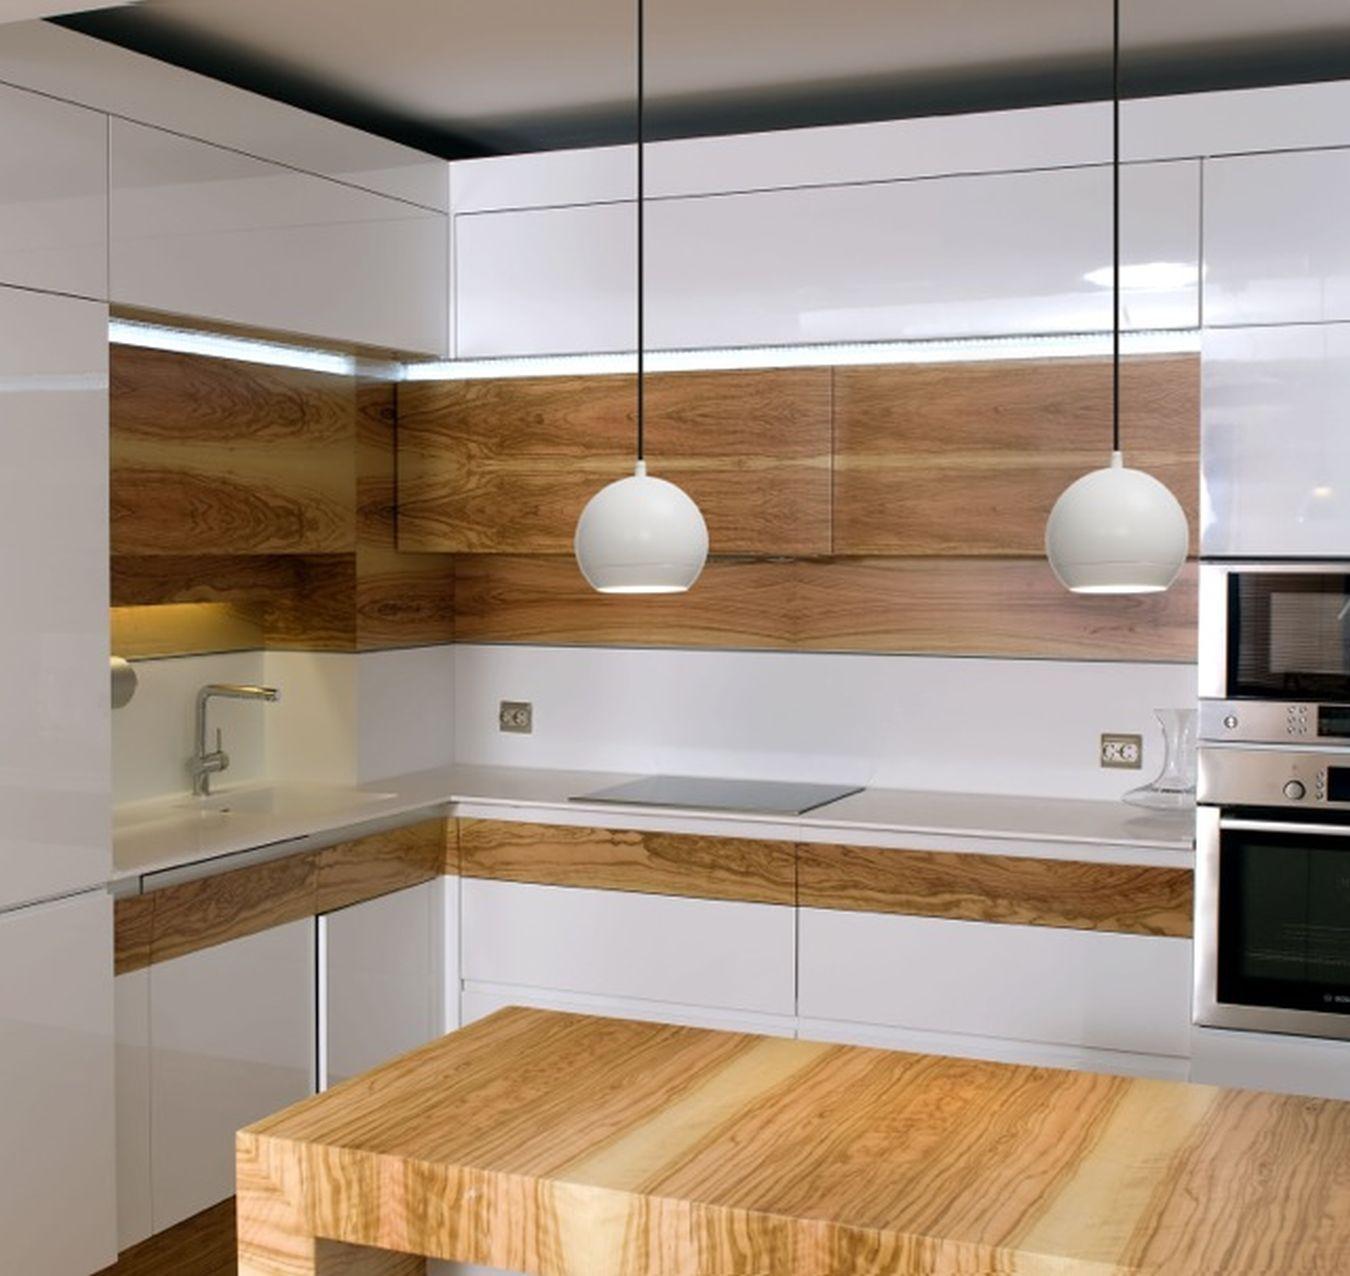 Iluminacion Led Cocinas Que Necesito Tutiendastorees - Luces-cocina